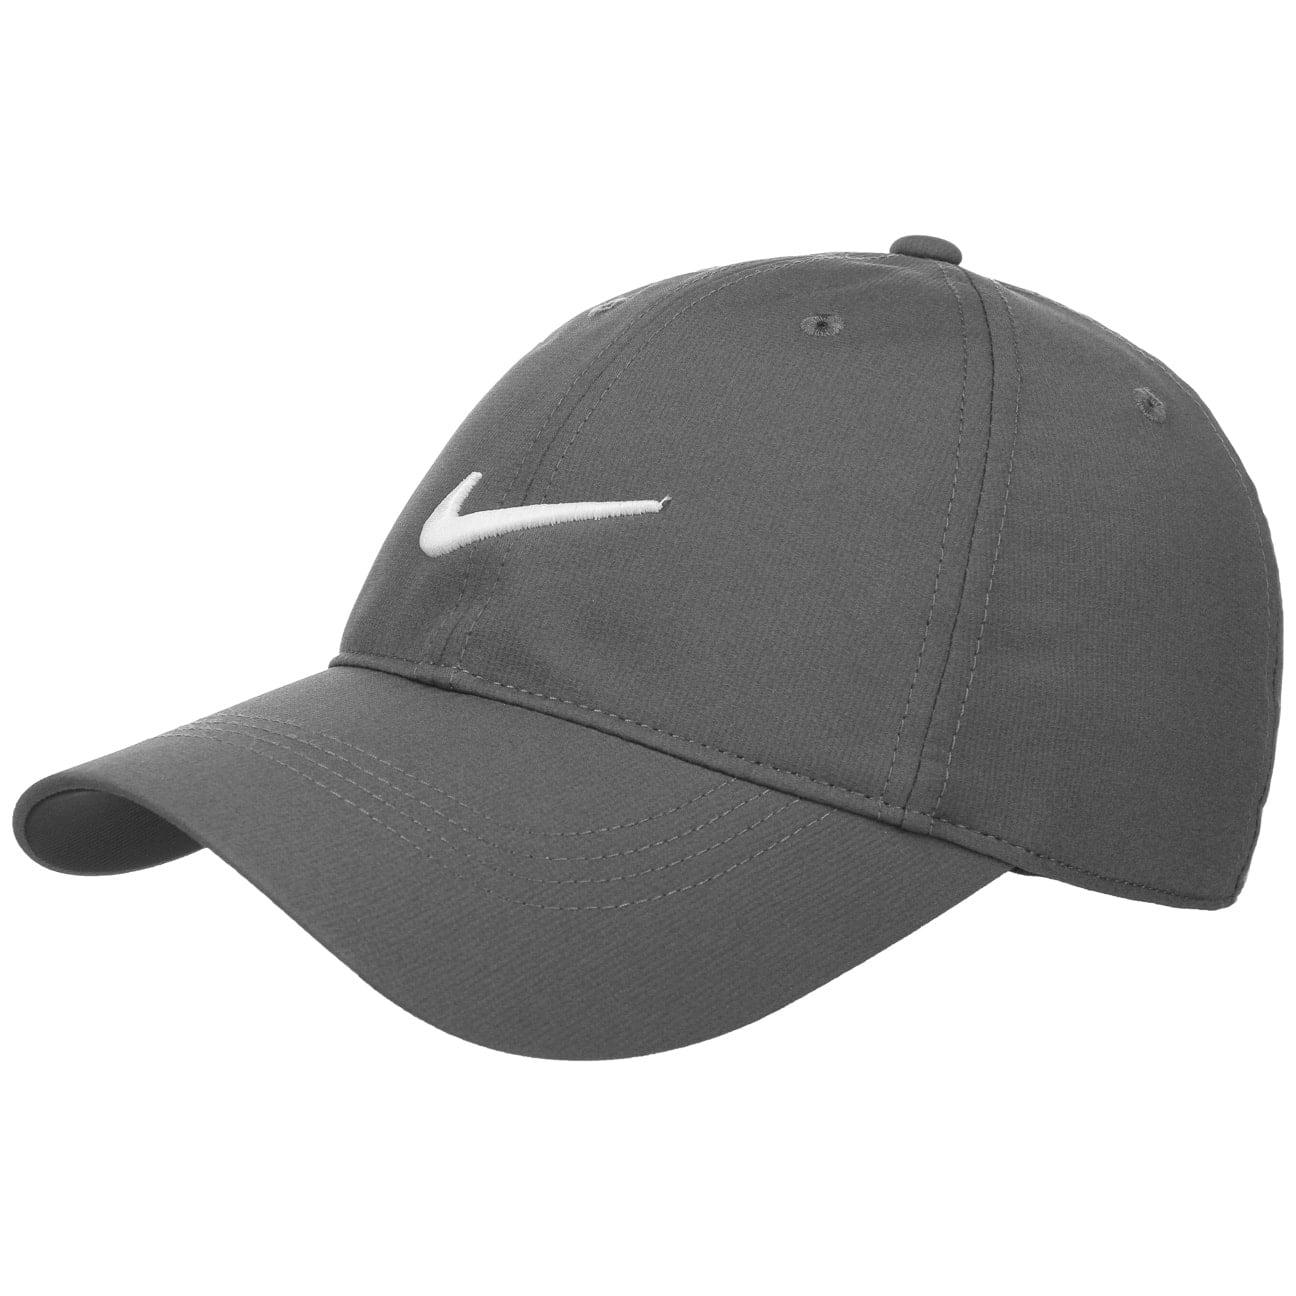 ... Legacy91 Tech Cap by Nike - grigio scuro 2 ... 151d97bb0bf1